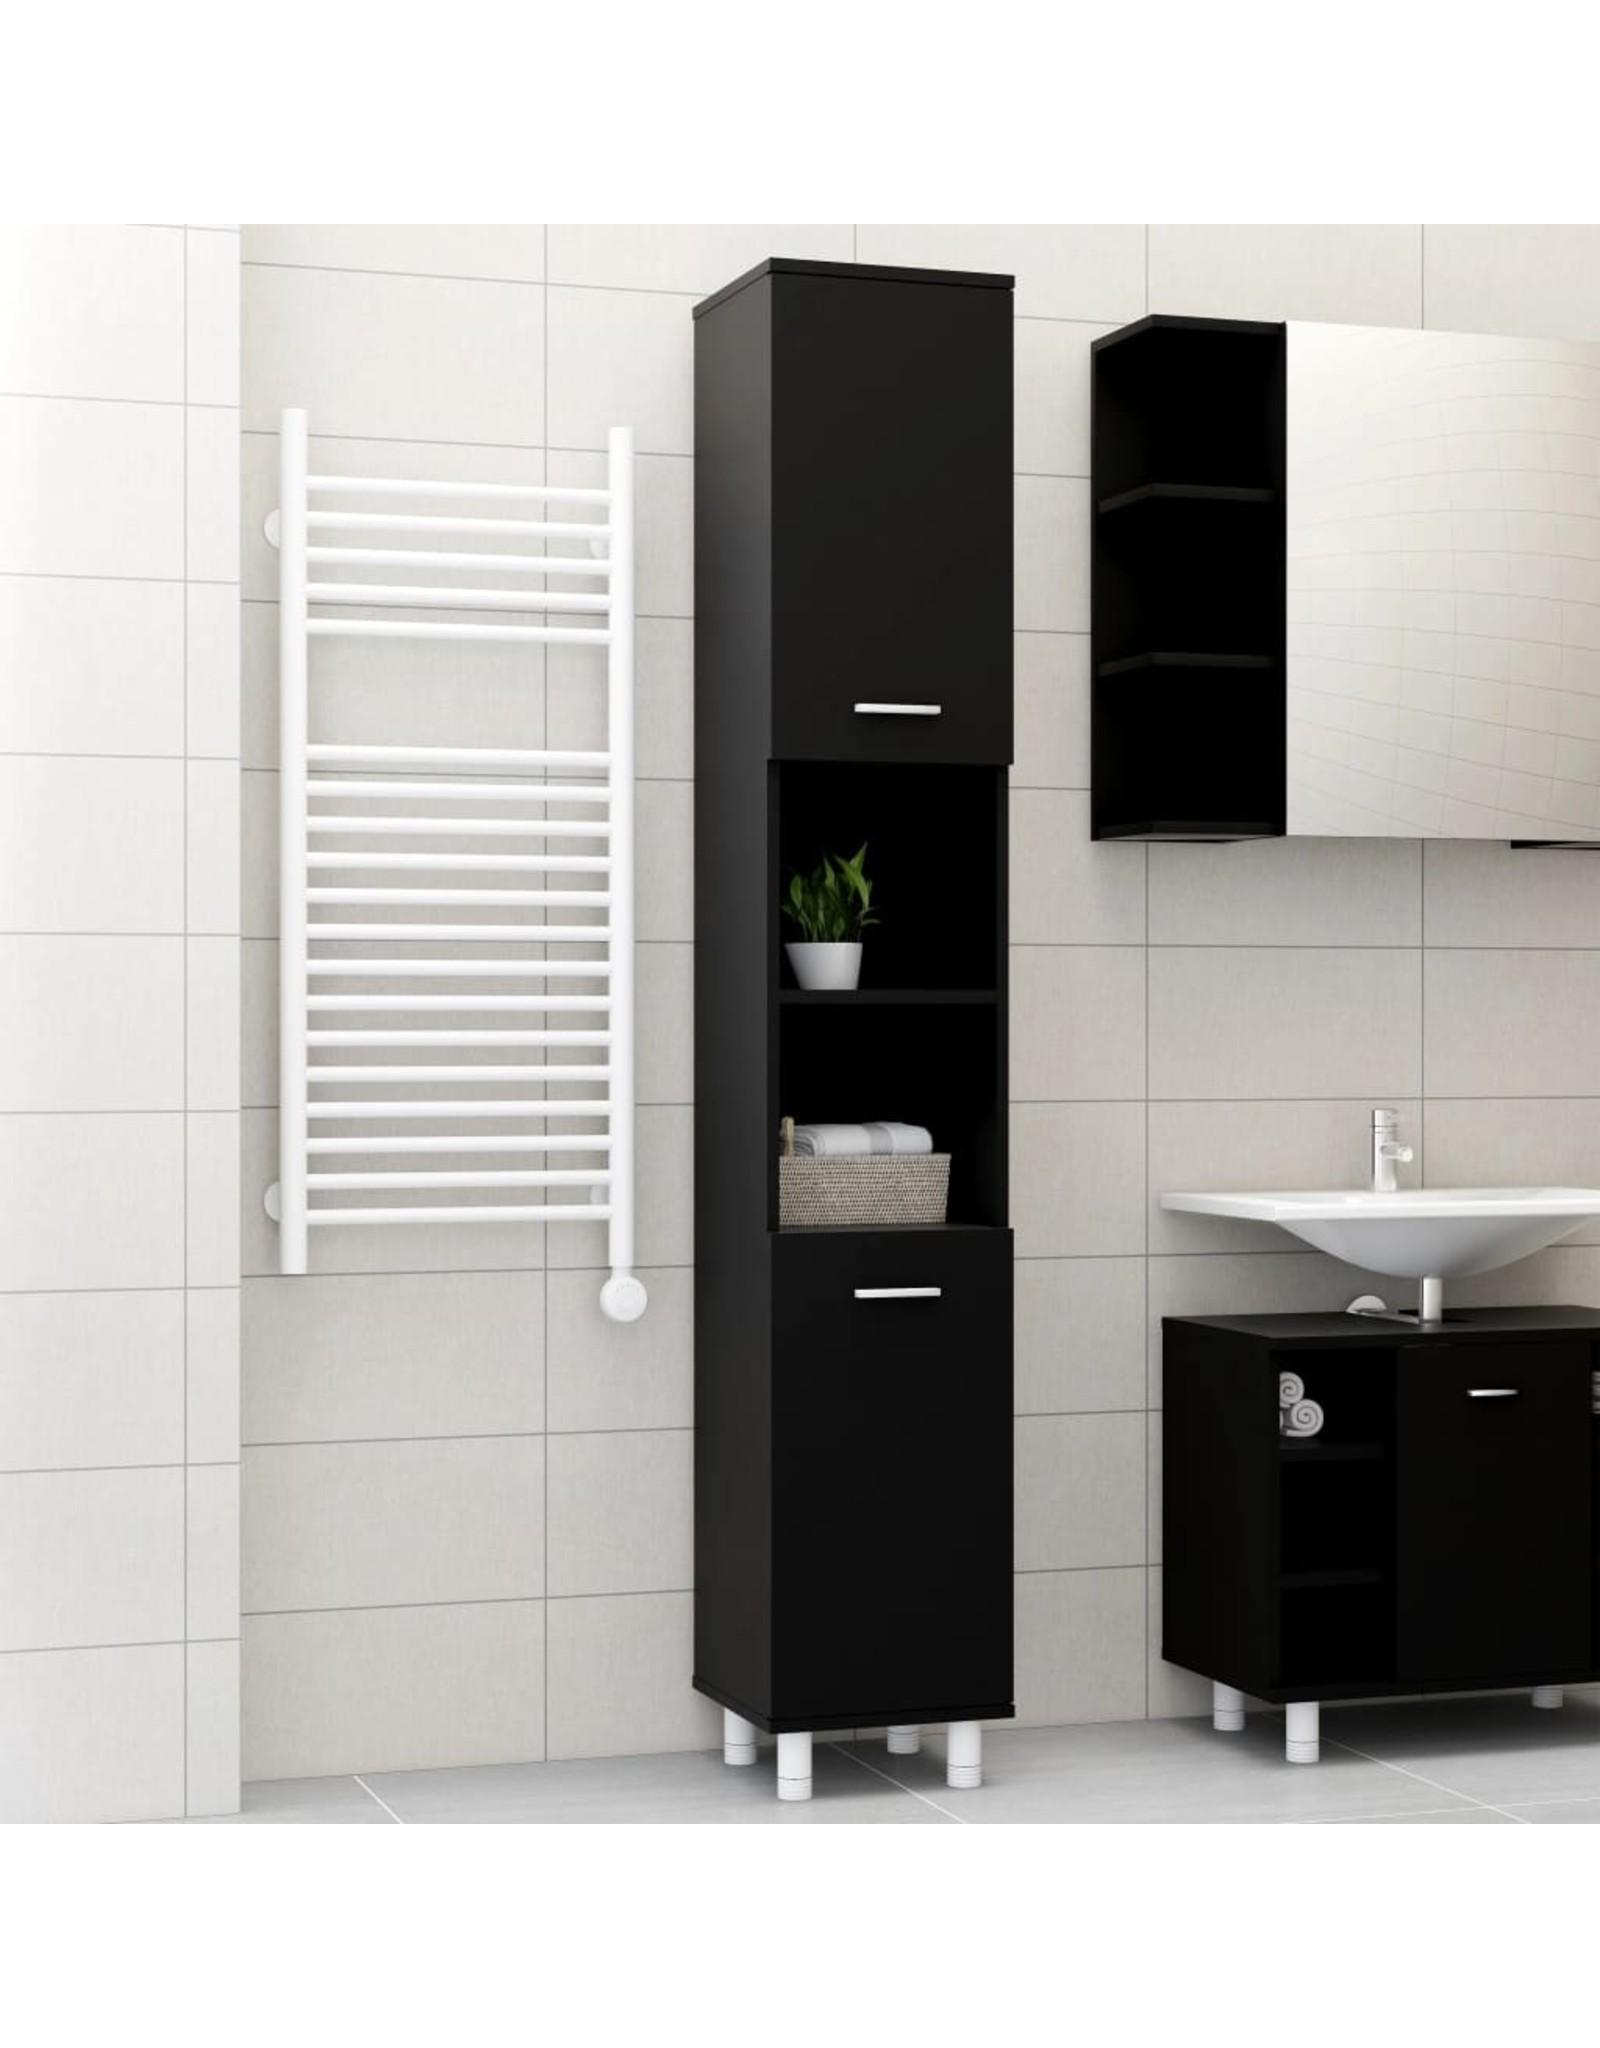 Badkamerkast 30x30x179 cm spaanplaat zwart